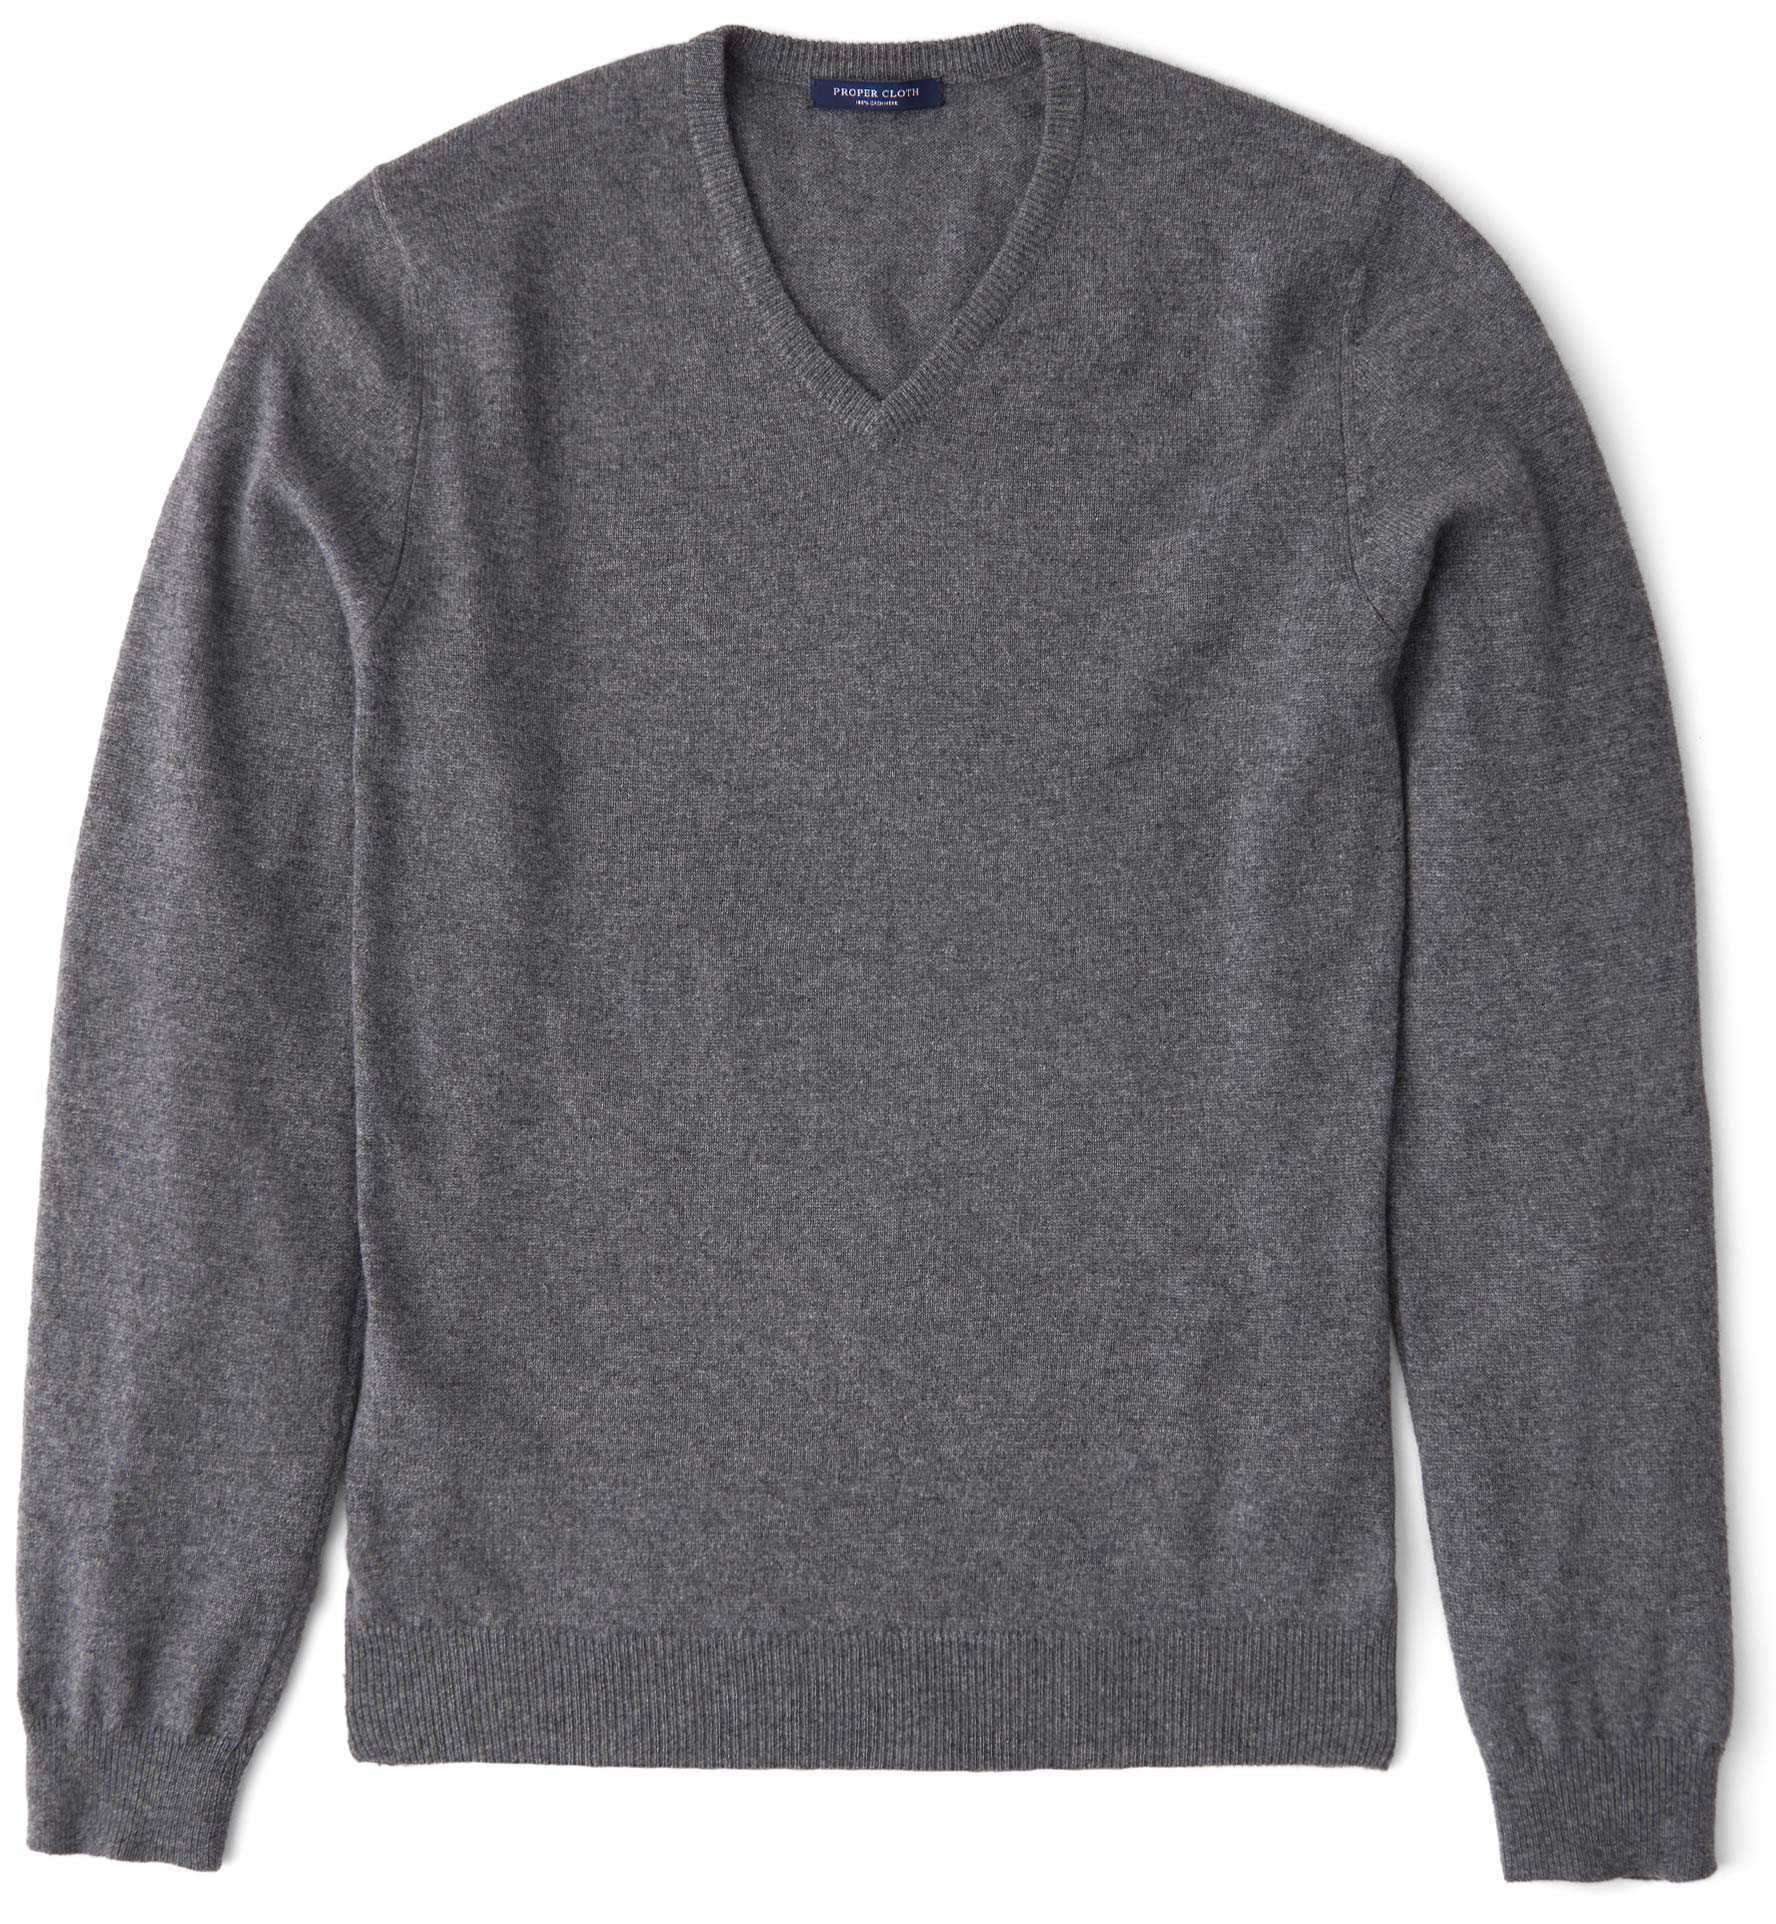 Zoom Image of Grey Cashmere V-Neck Sweater